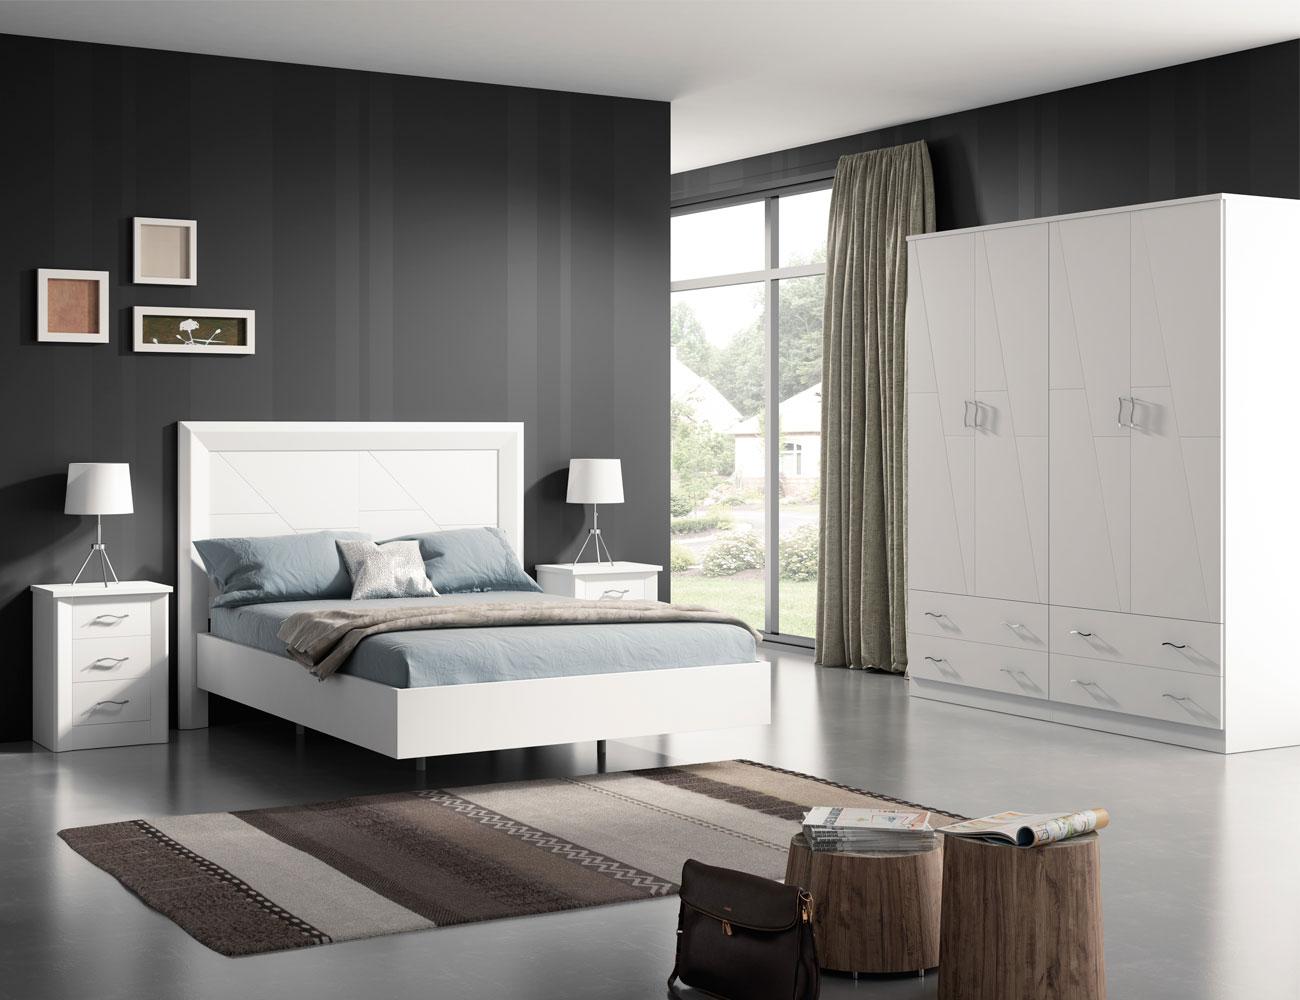 3 dormitorio matrimonio madera dm blanco lacado2